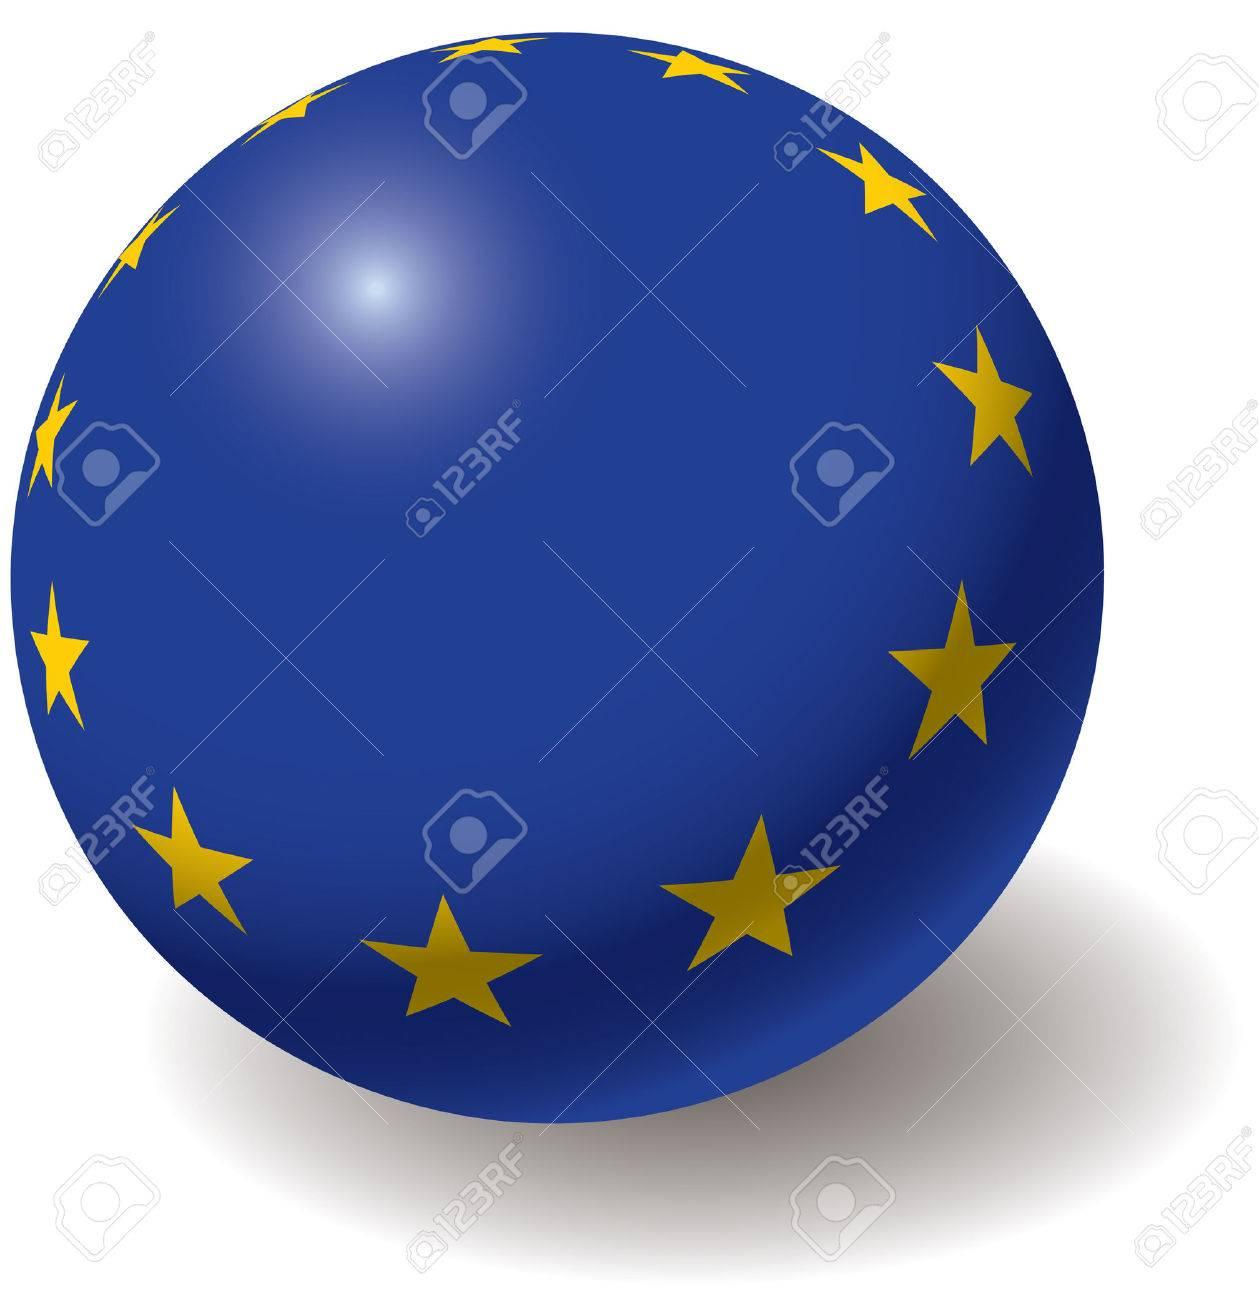 European union flag texture on ball. Design element. Isolated on white. Vector illustration. Stock Vector - 4432381